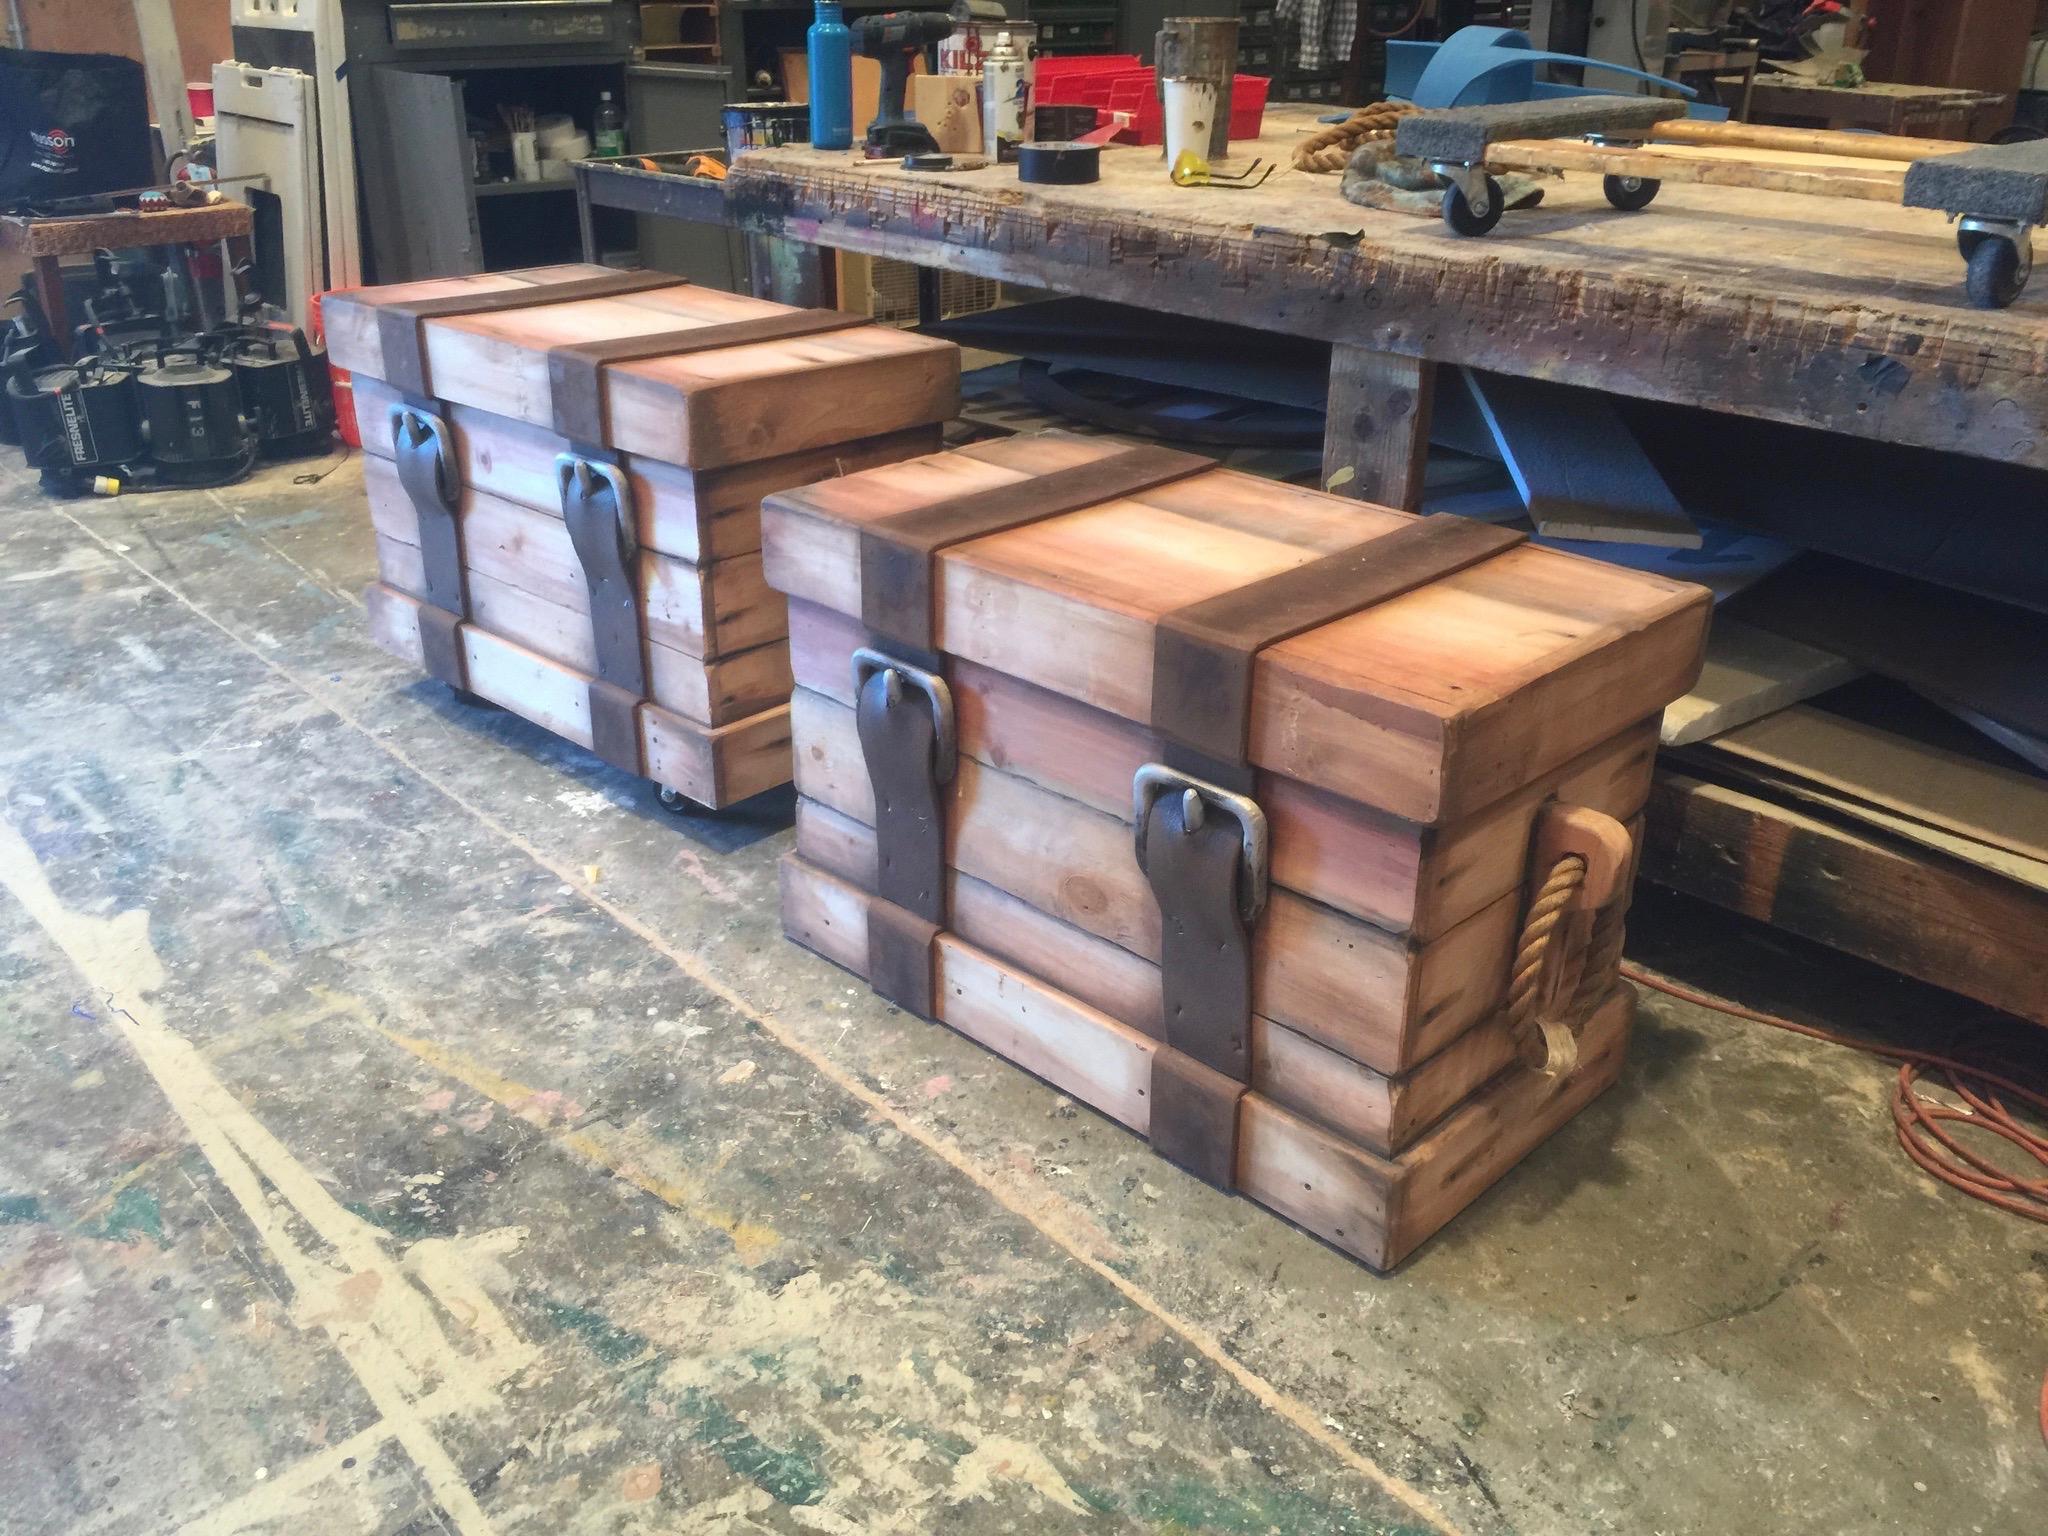 Matching Starstuff trunks